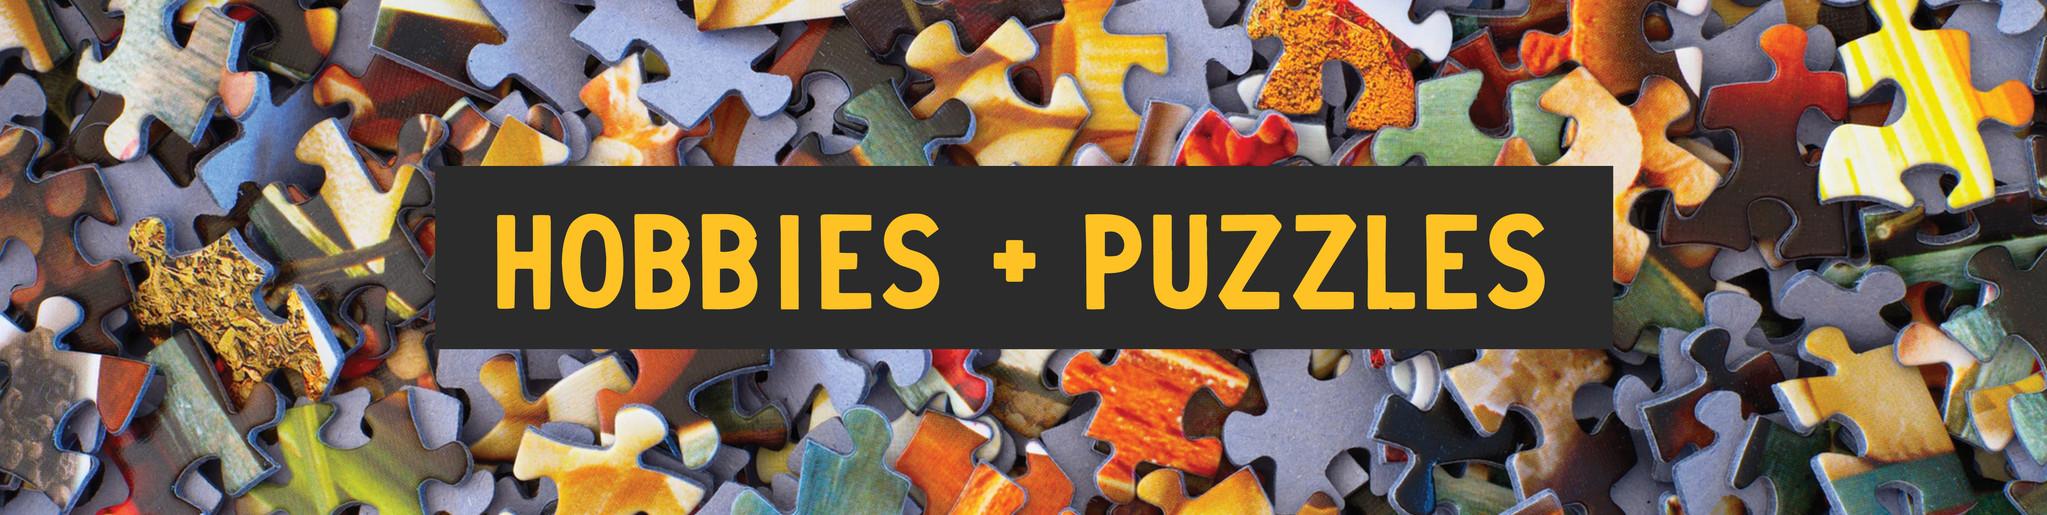 Hobbies + Puzzles